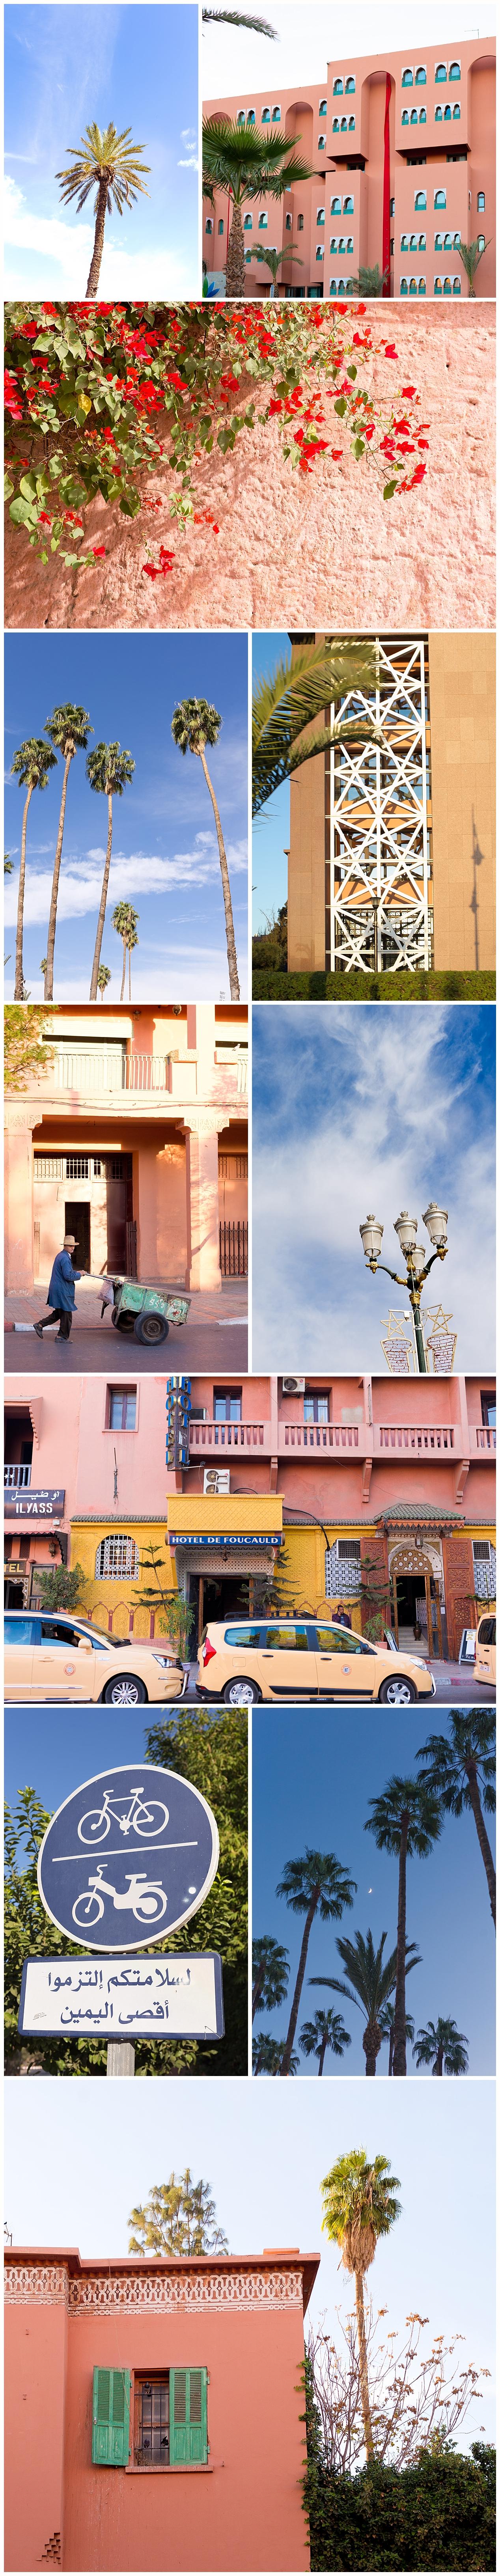 scenery details in Ville Nouvelle Marrakech